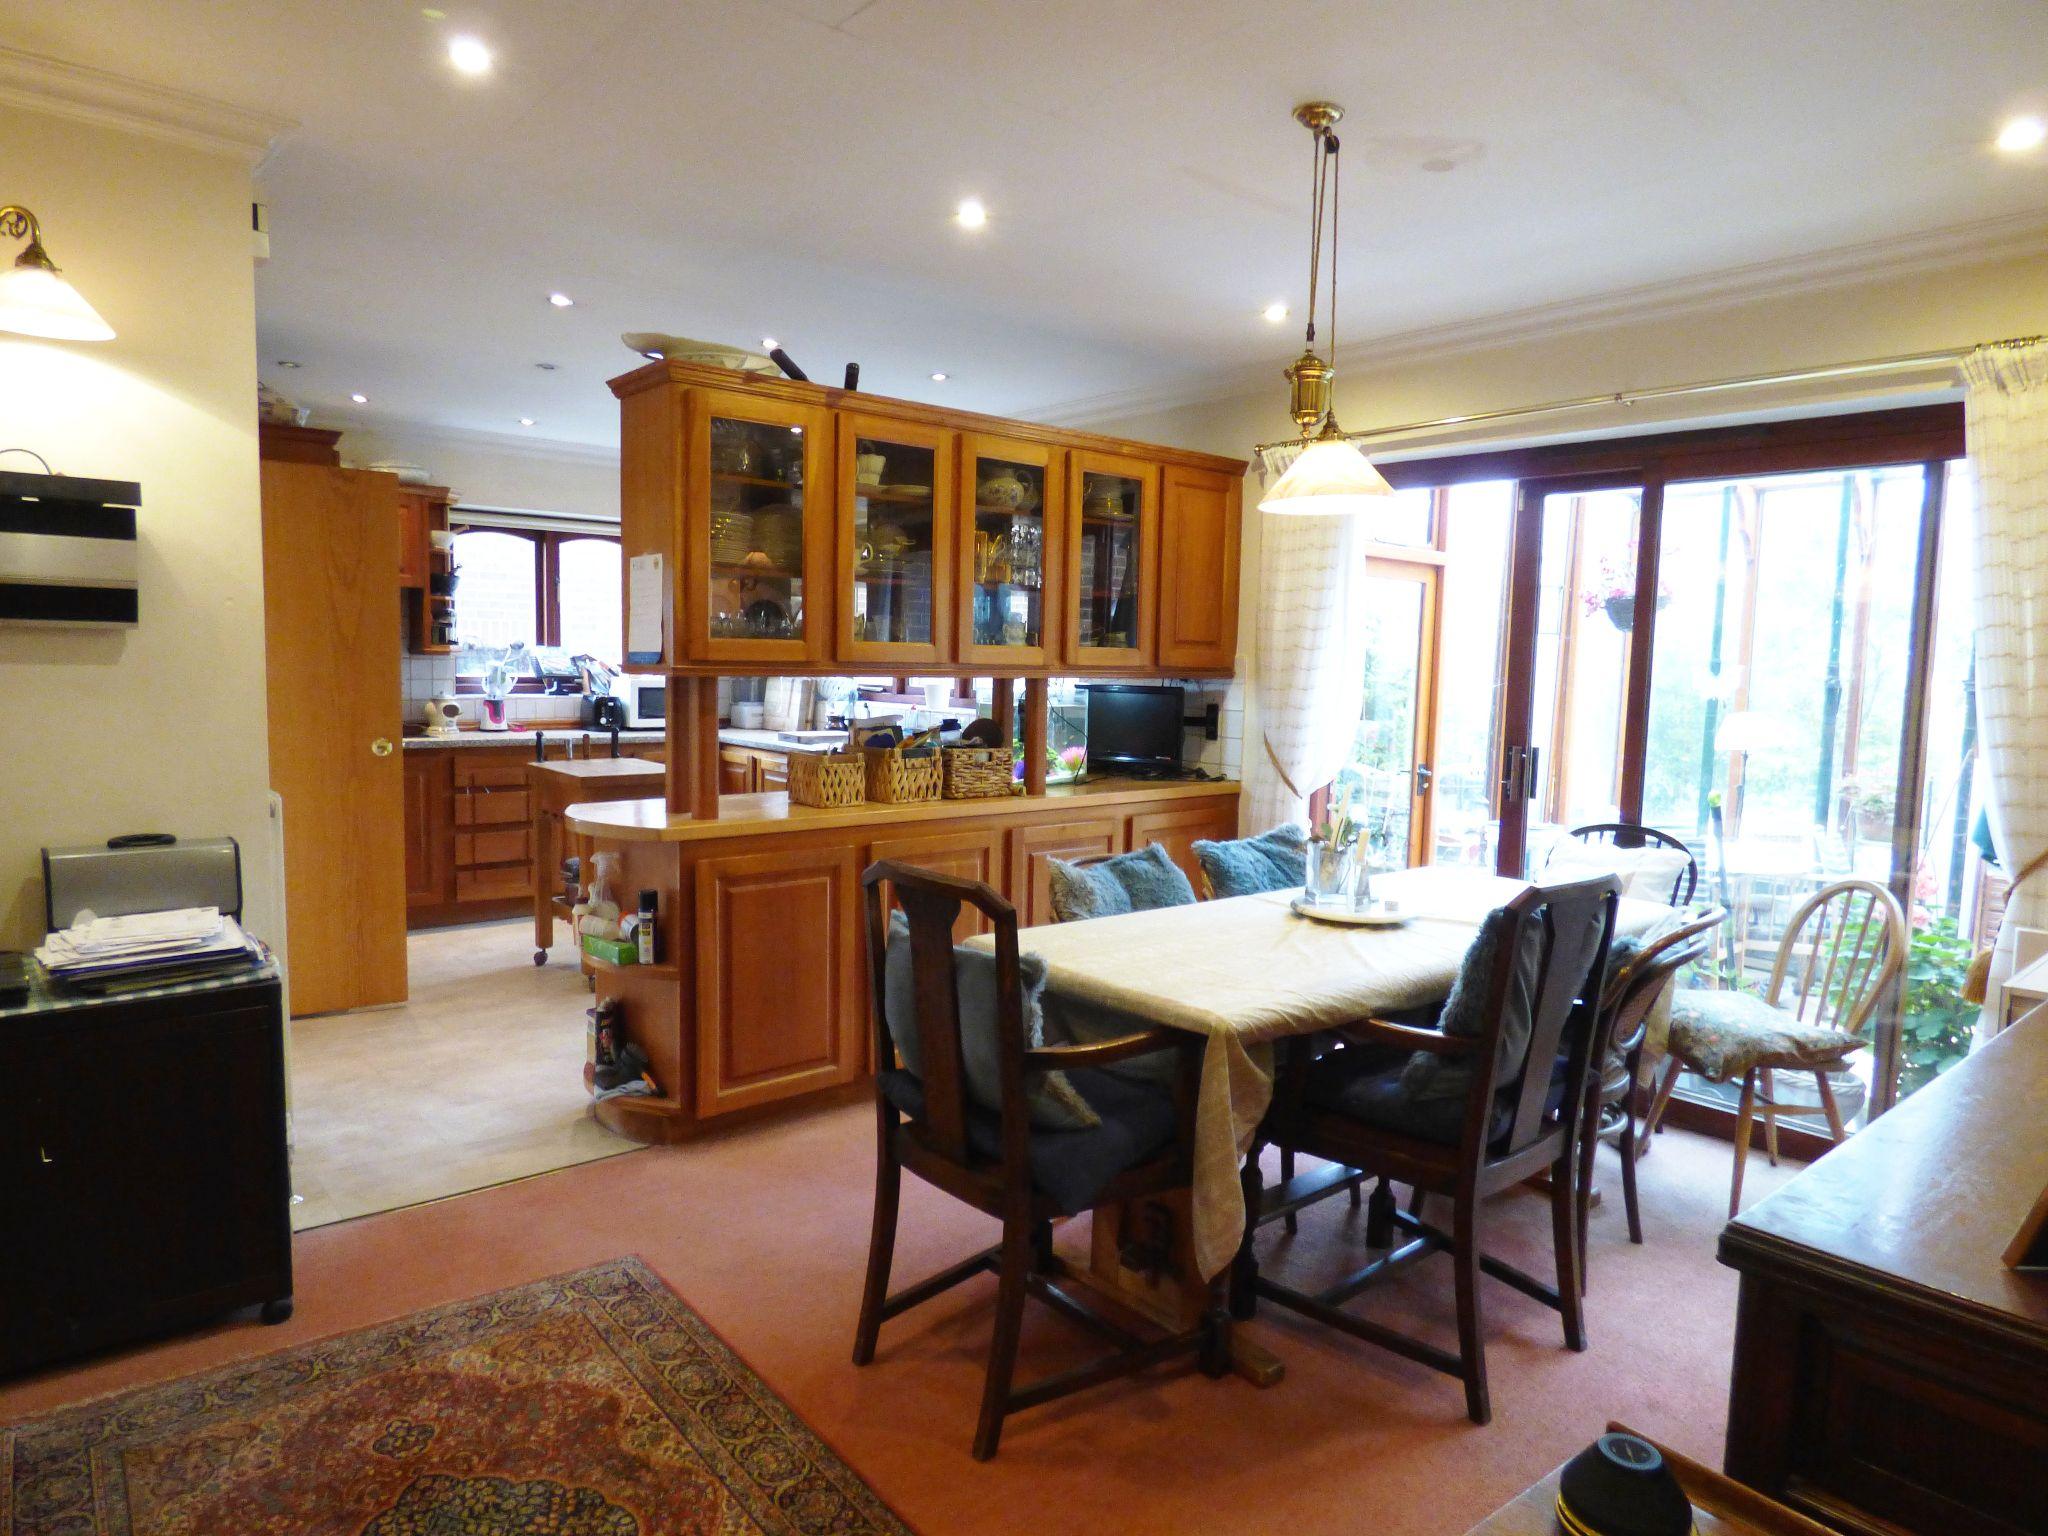 4 Bedroom Detached House For Sale - Dining Kitchen